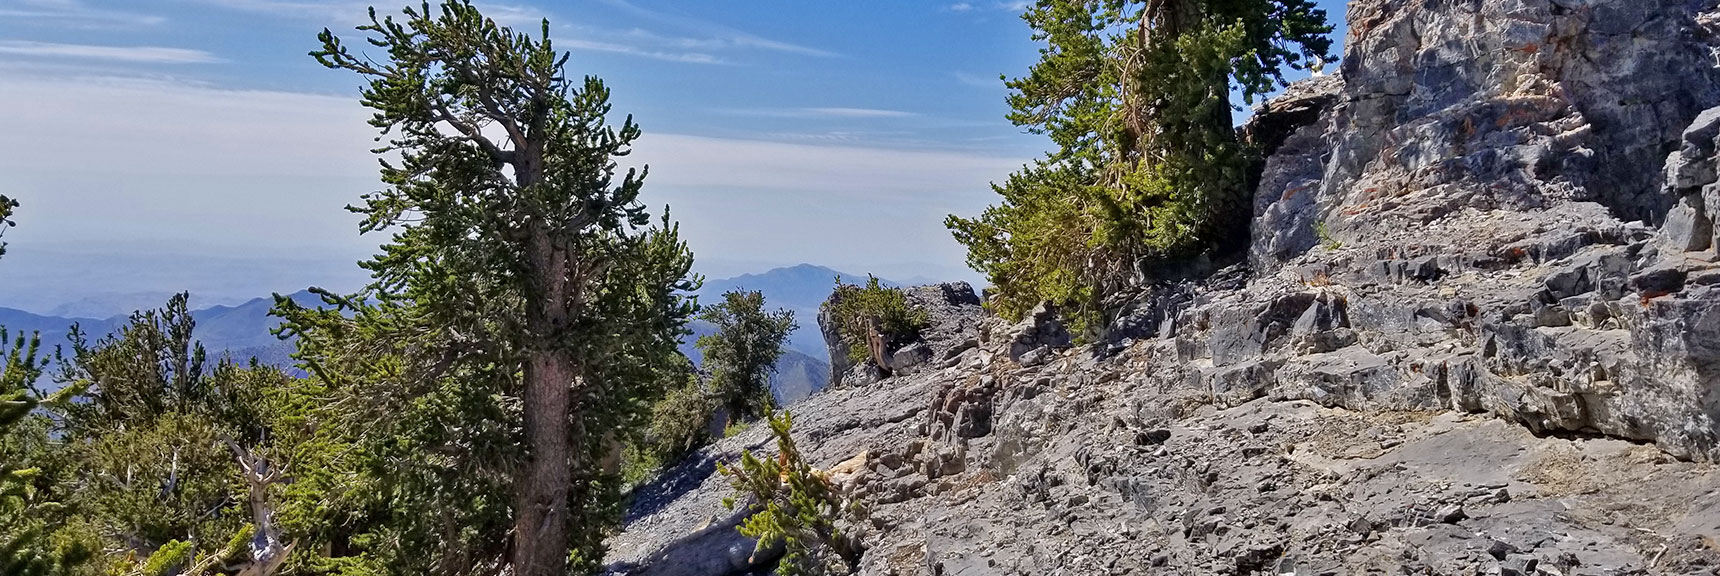 Arrival at Mummy's Knees, Granite Rock and Bristlecone Pines | Mummy Mountain's Knees | Mt. Charleston Wilderness, Nevada 018